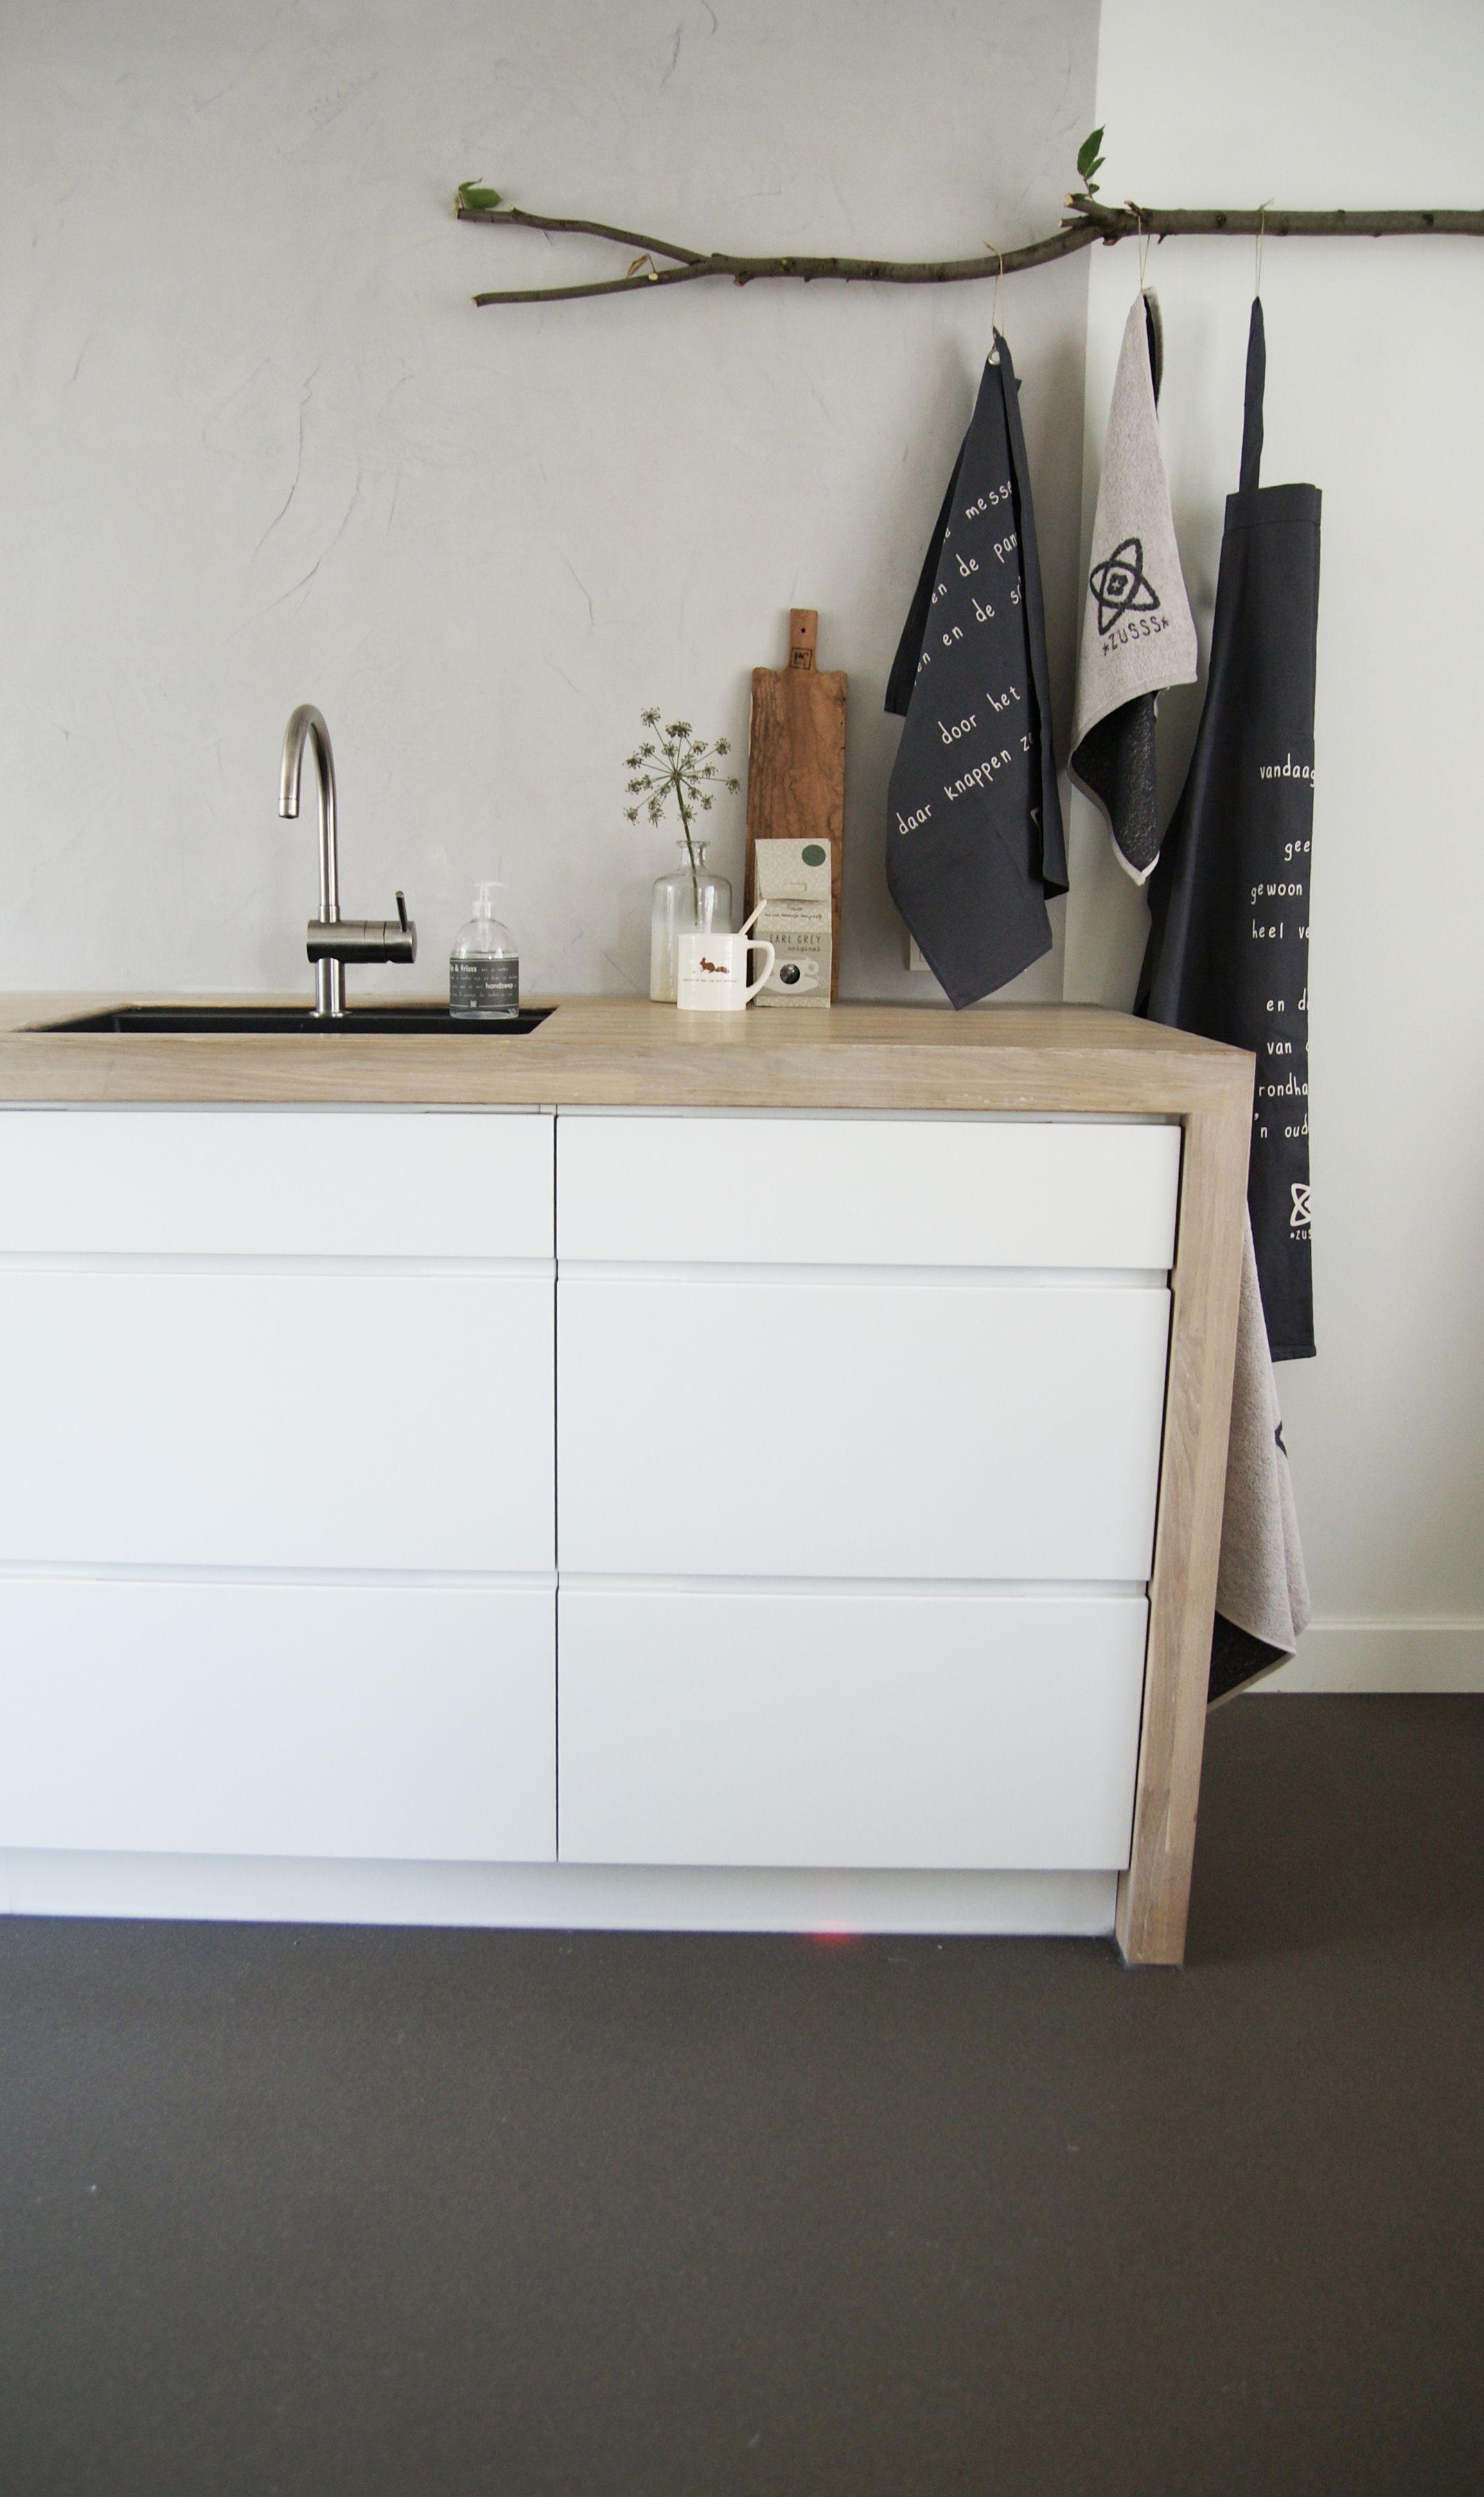 Zusss Keukentextiel Ikea Keuken Keuken Idee Keuken Interieur